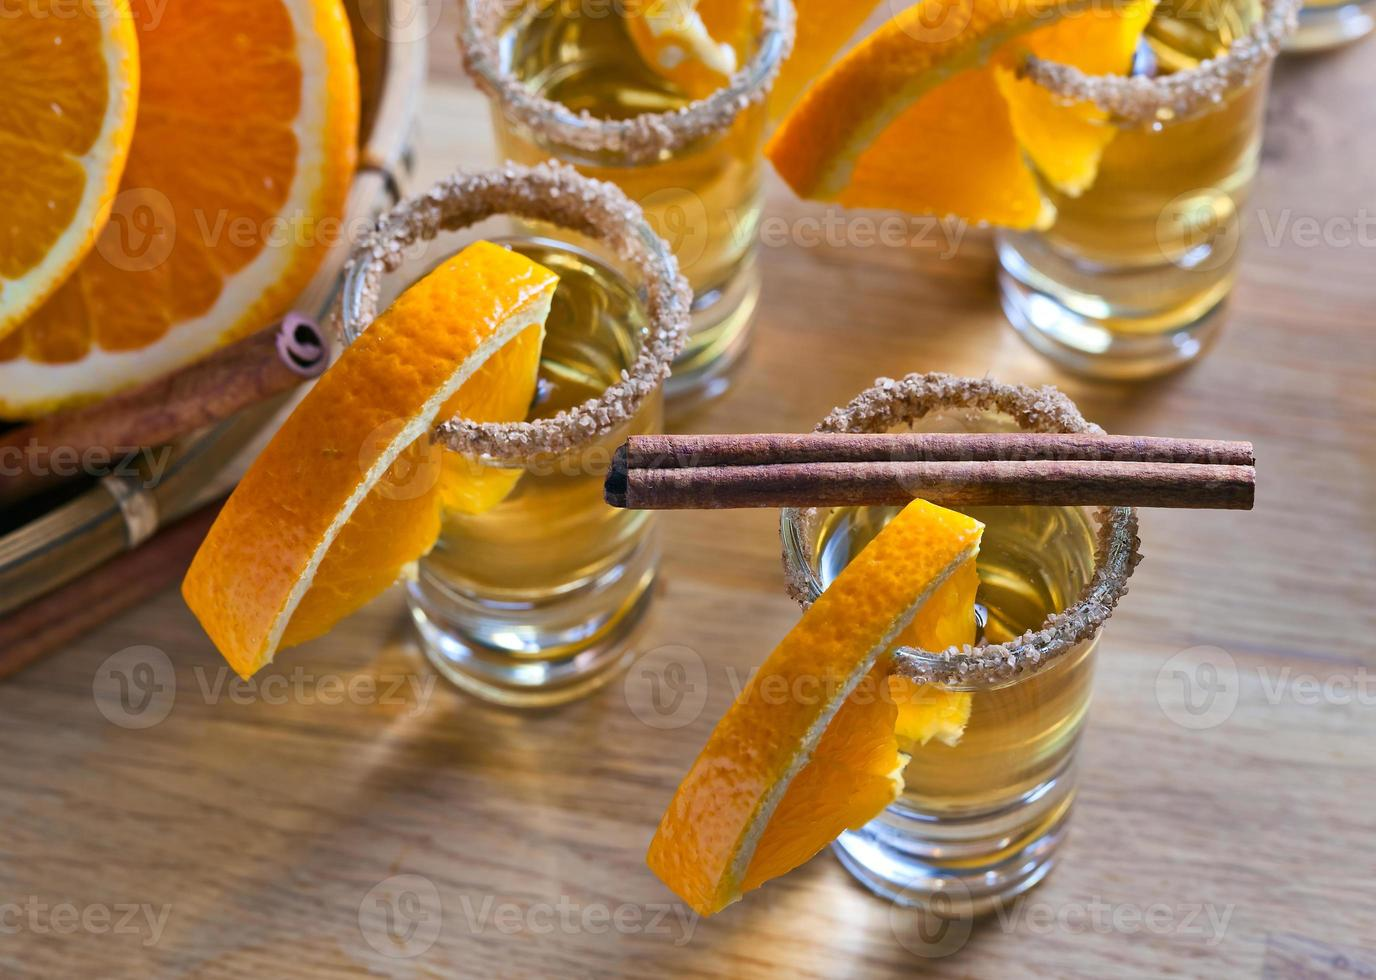 tequila con naranja foto